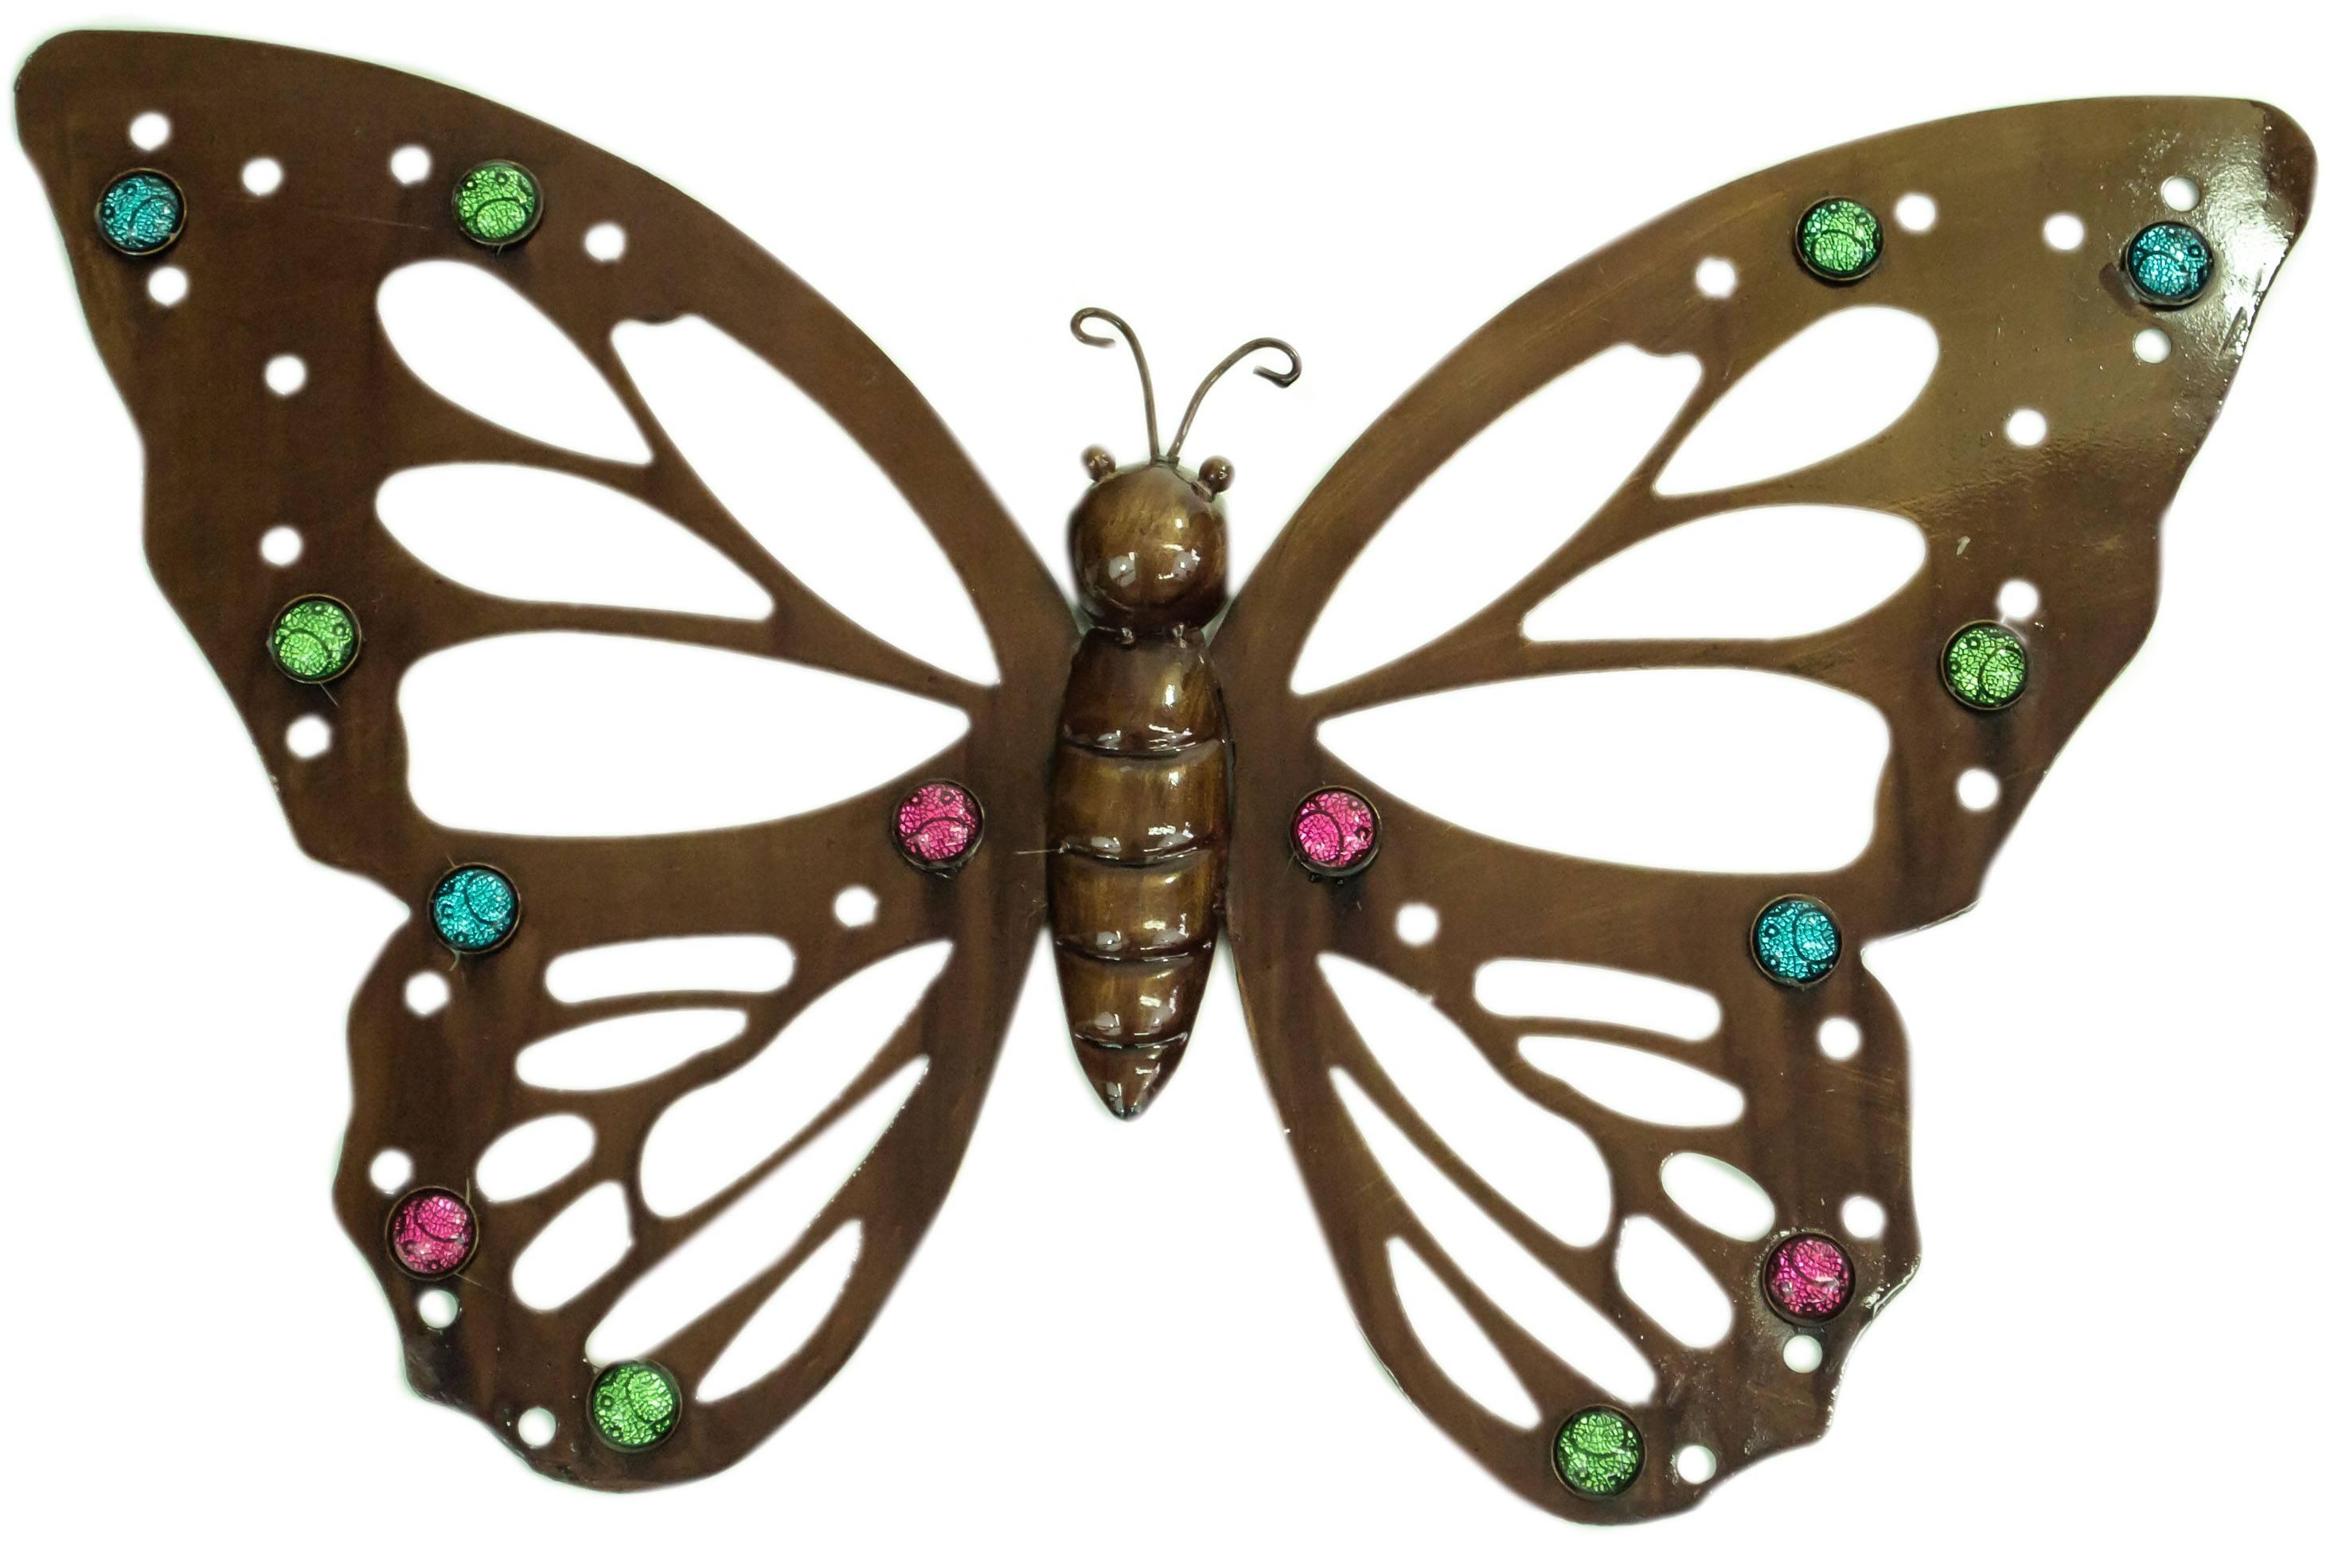 Cream Metal Butterfly Wall Art | Wallartideas Throughout 2018 Large Metal Butterfly Wall Art (View 11 of 25)